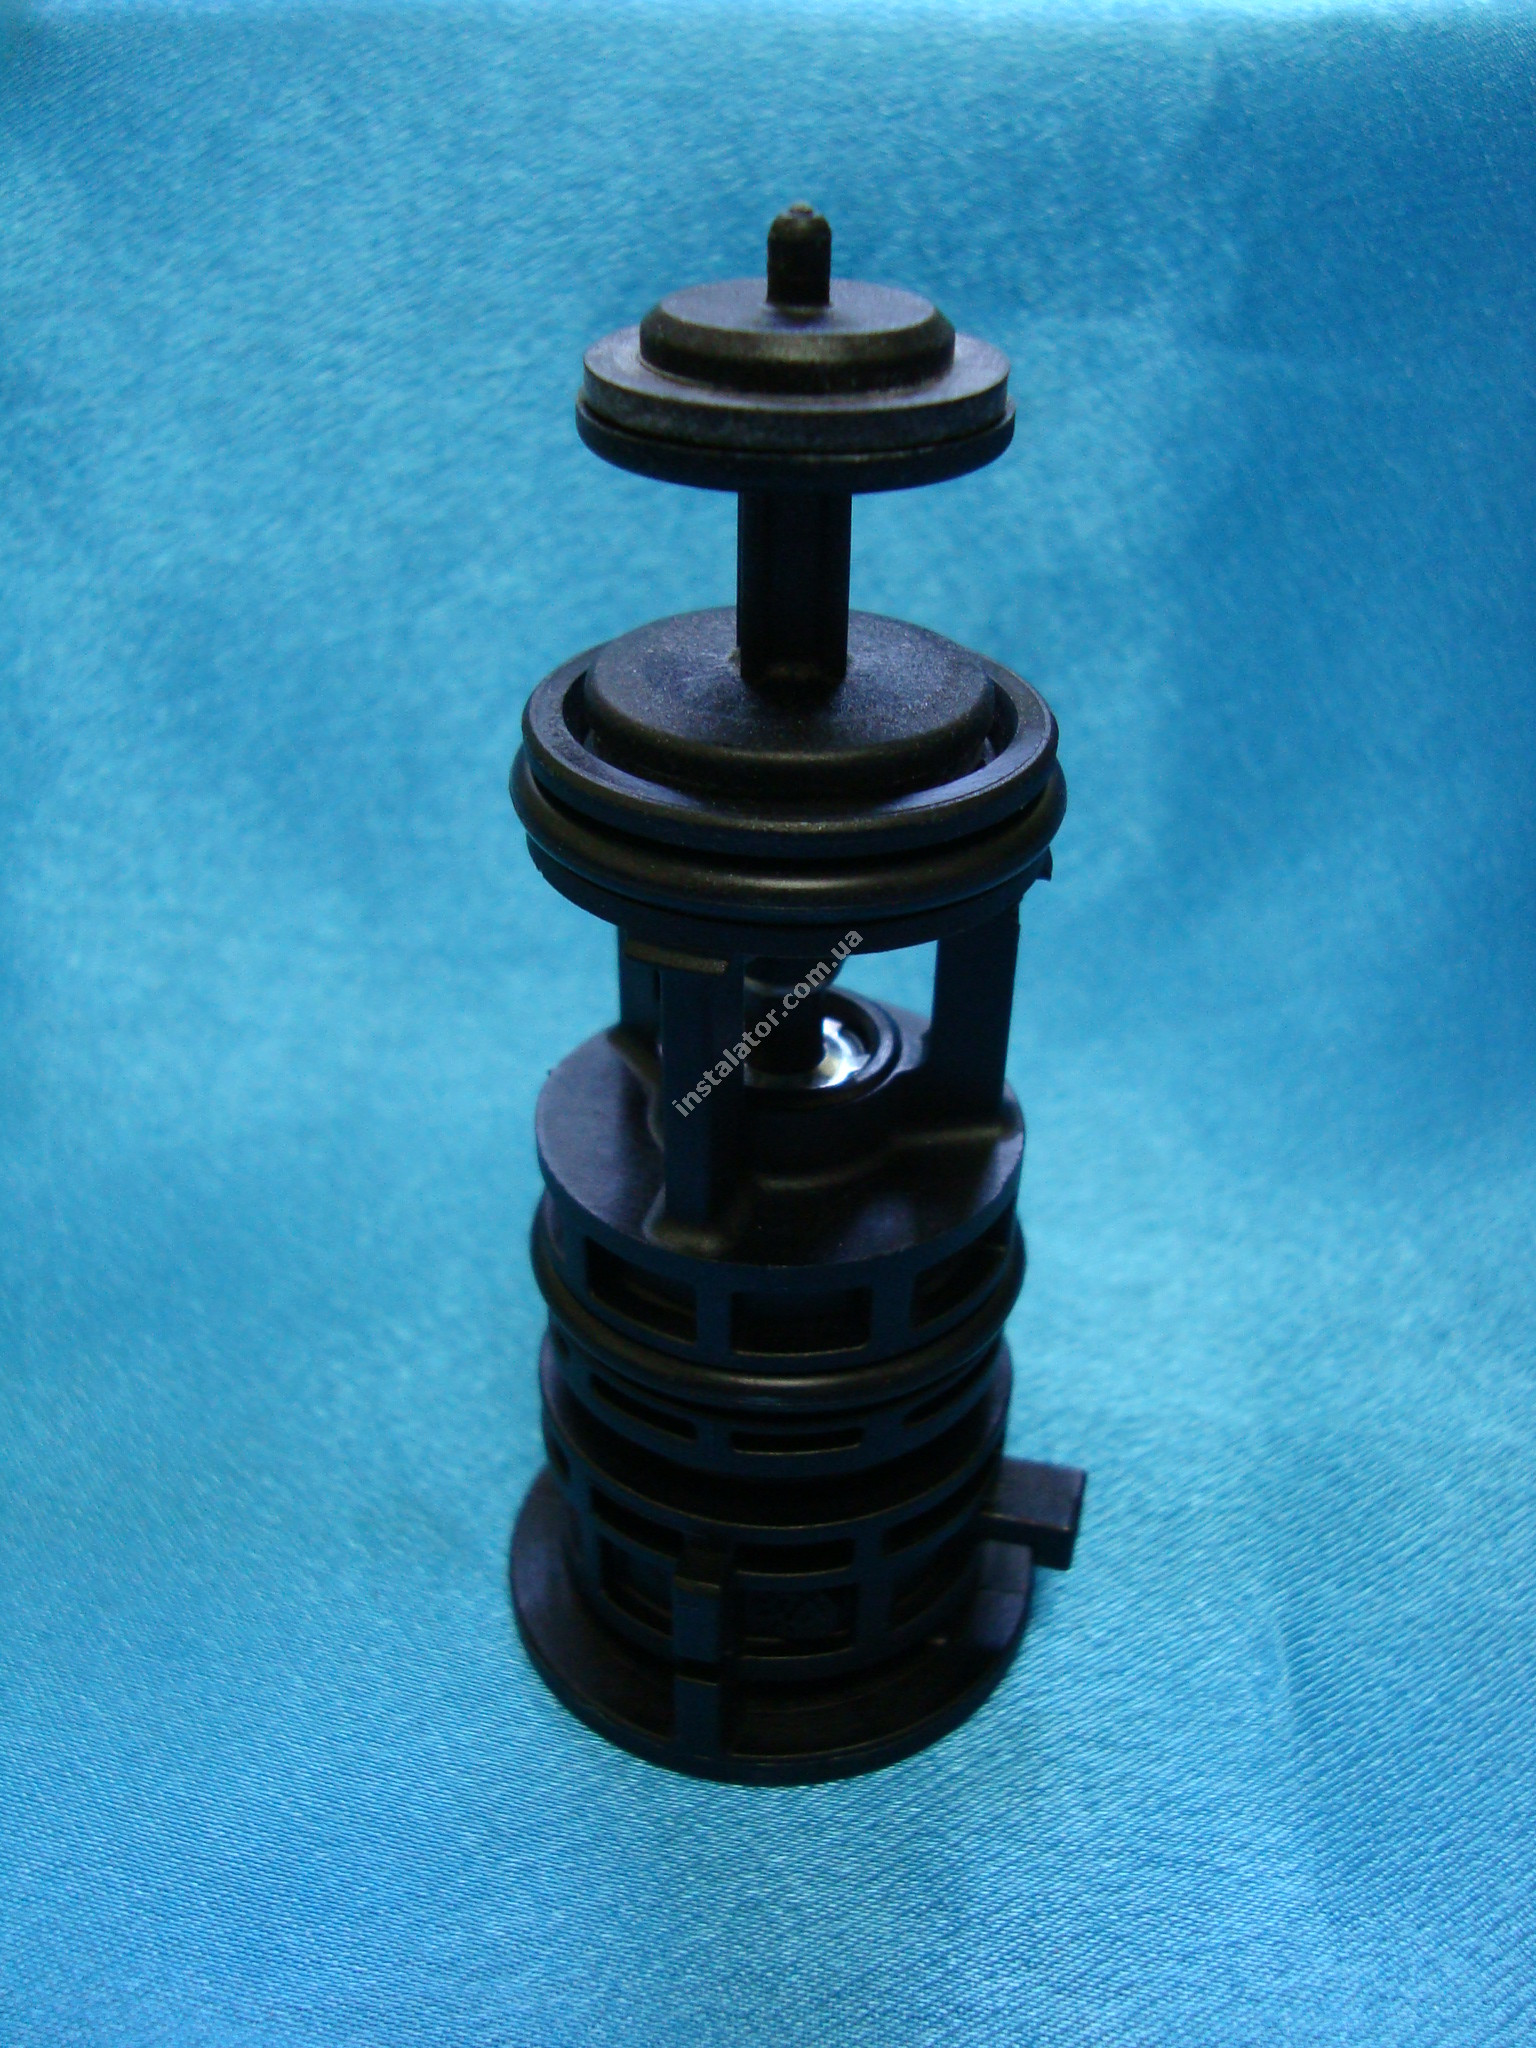 721403800 Картридж 3-х ходового клапана Baxi ECO full-image-1